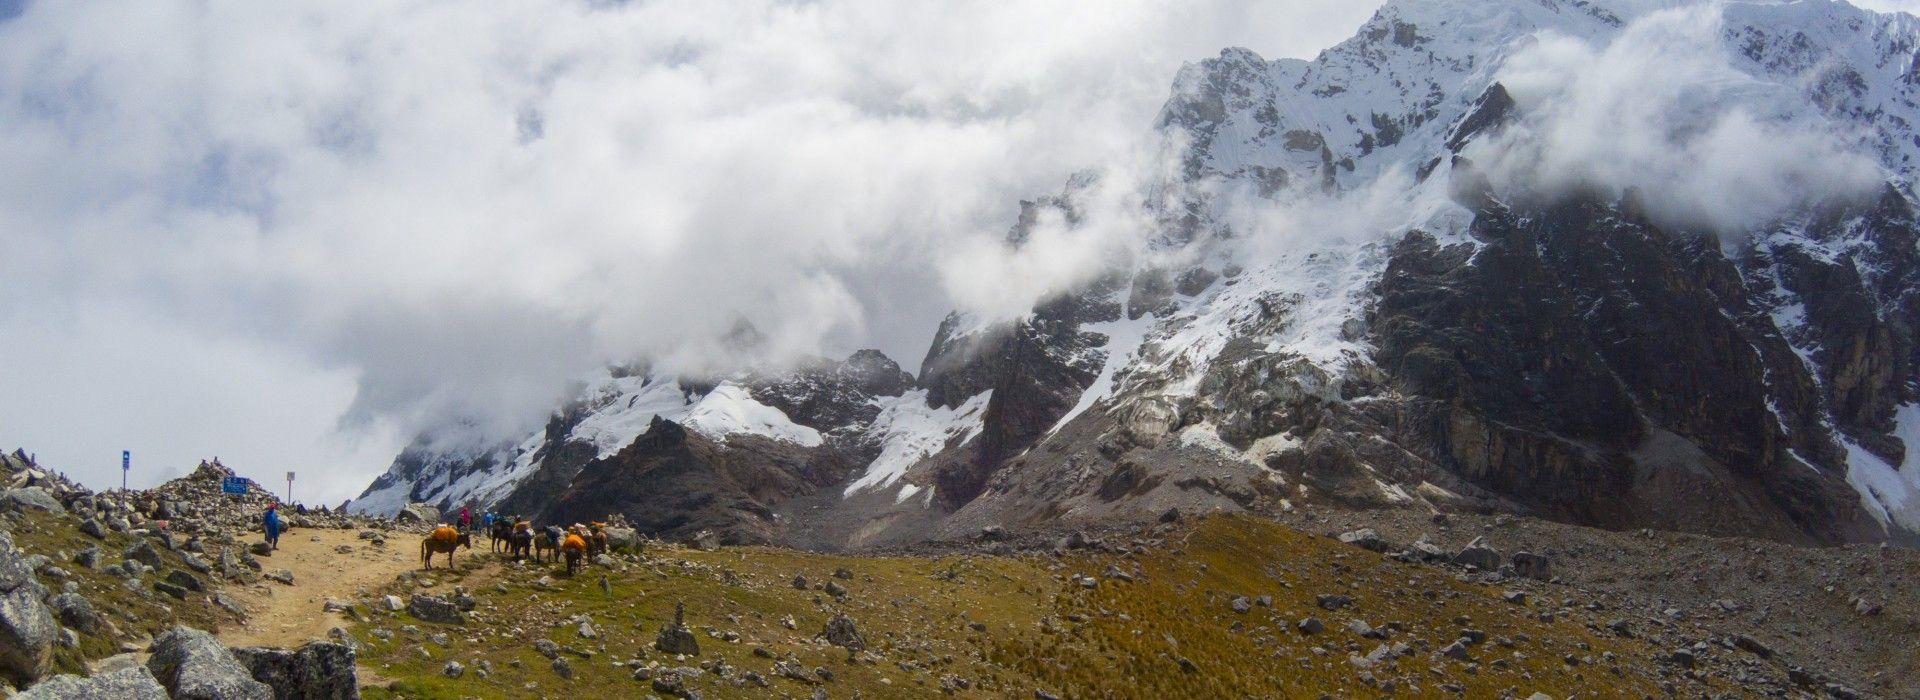 Volunteering Tours in Cusco